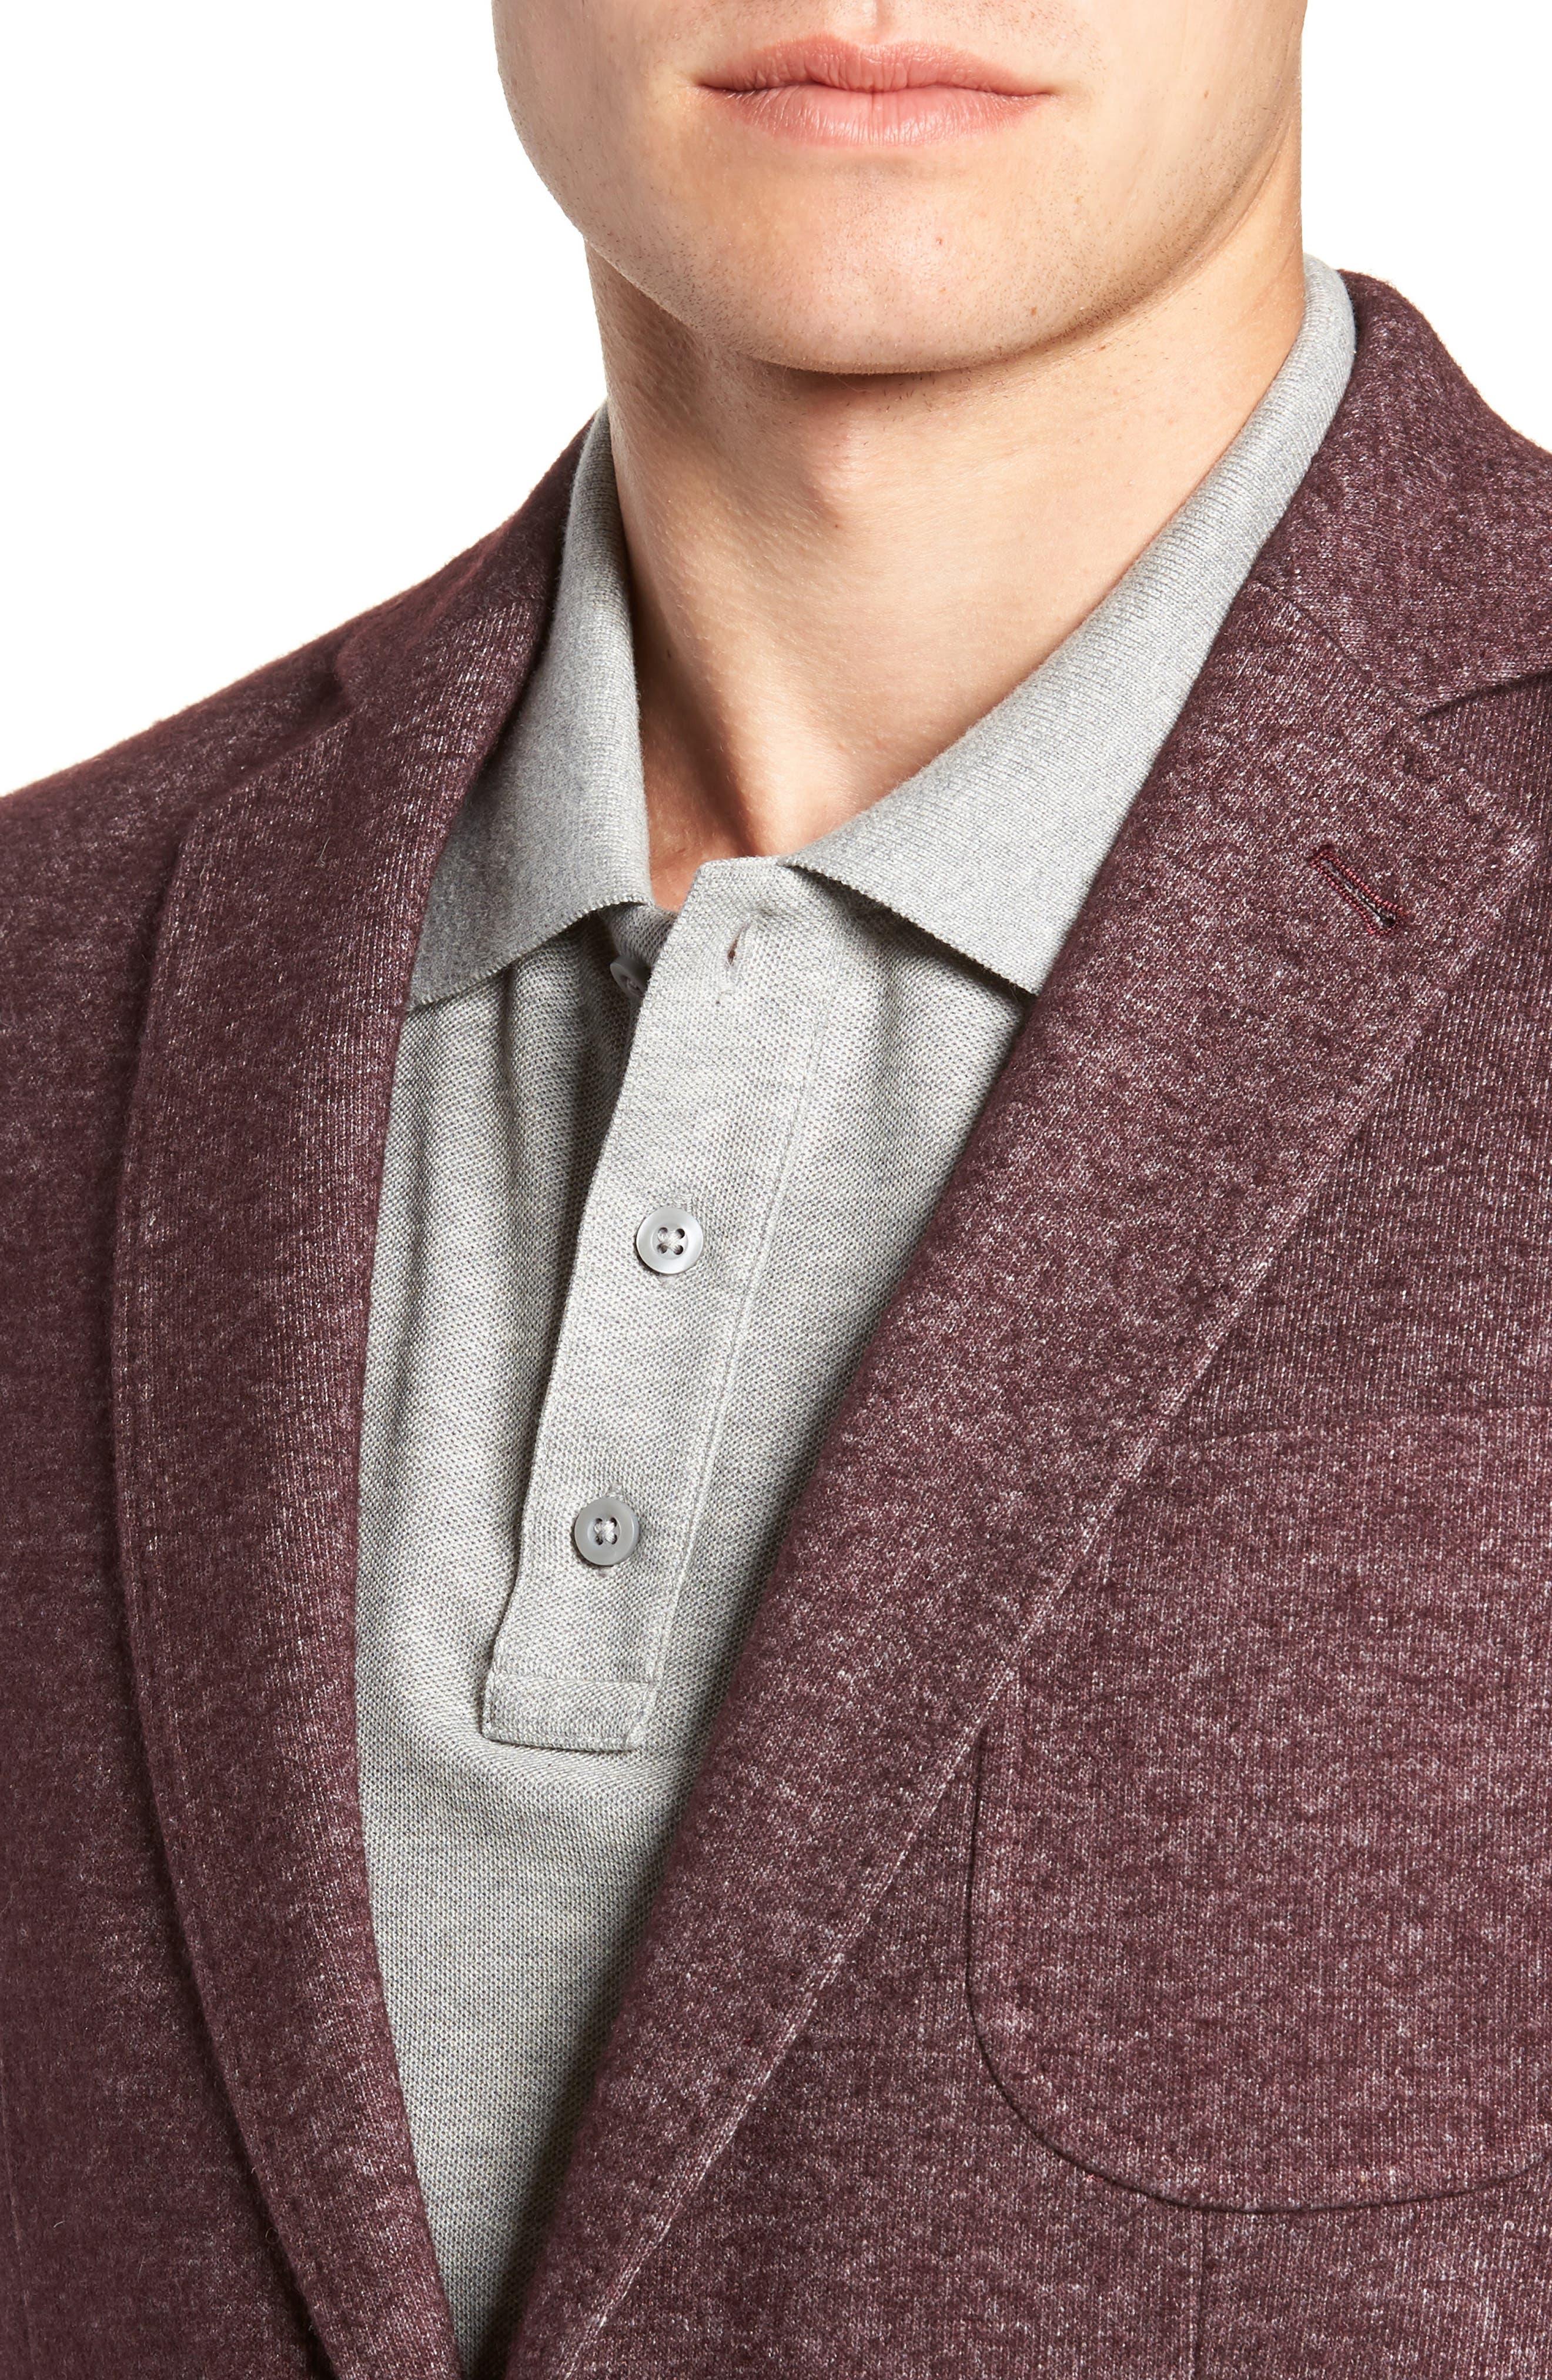 Regular Fit Knit Wool Blend Sport Coat,                             Alternate thumbnail 4, color,                             PORT